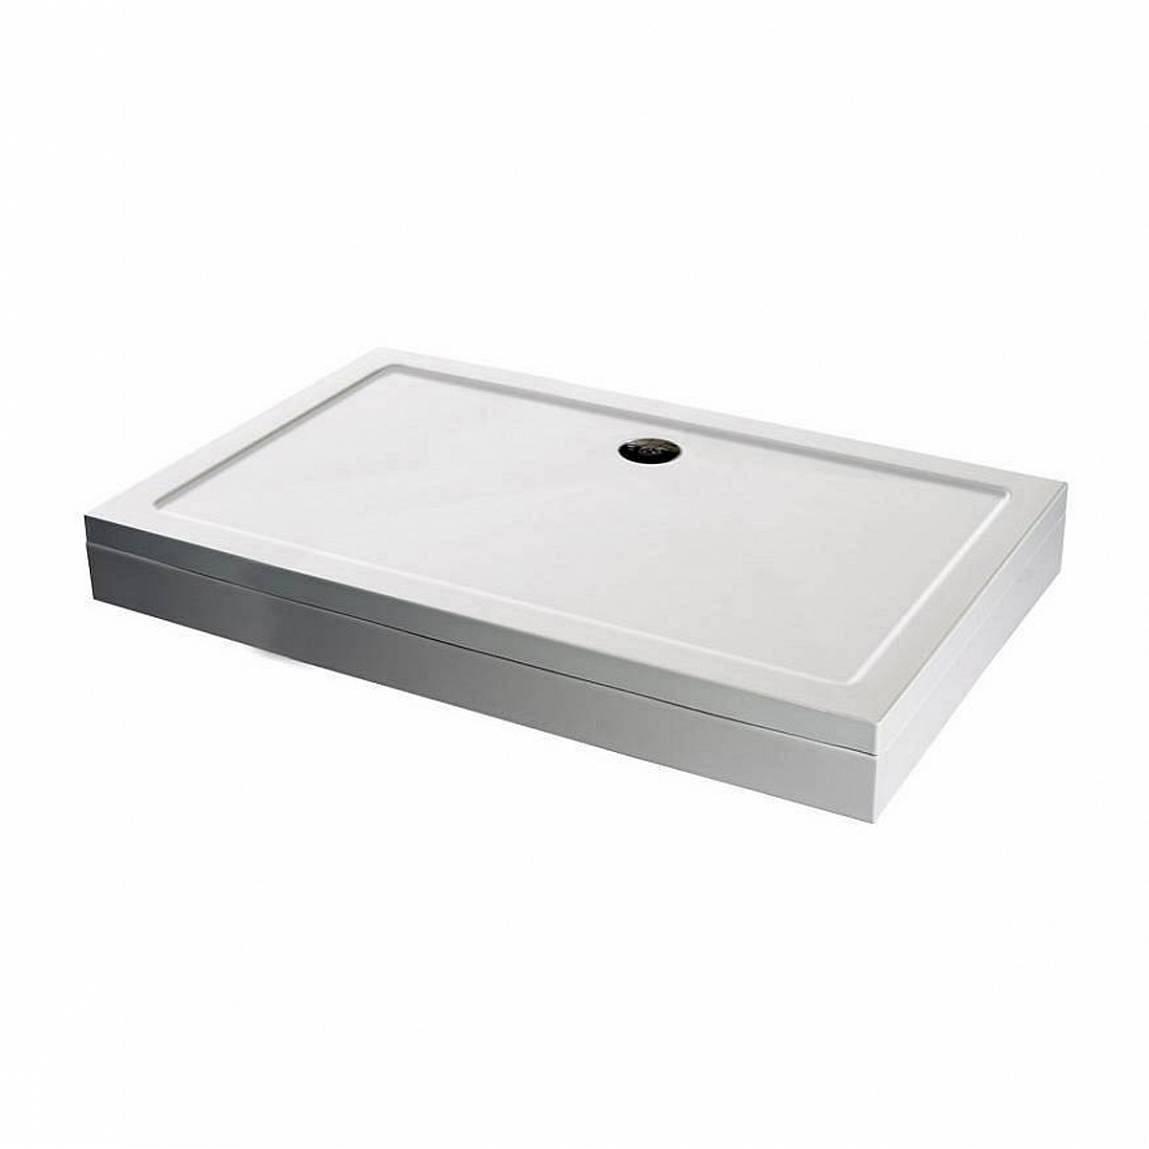 Image of Rectangular Stone Shower Tray & Riser Kit 1100 x 900